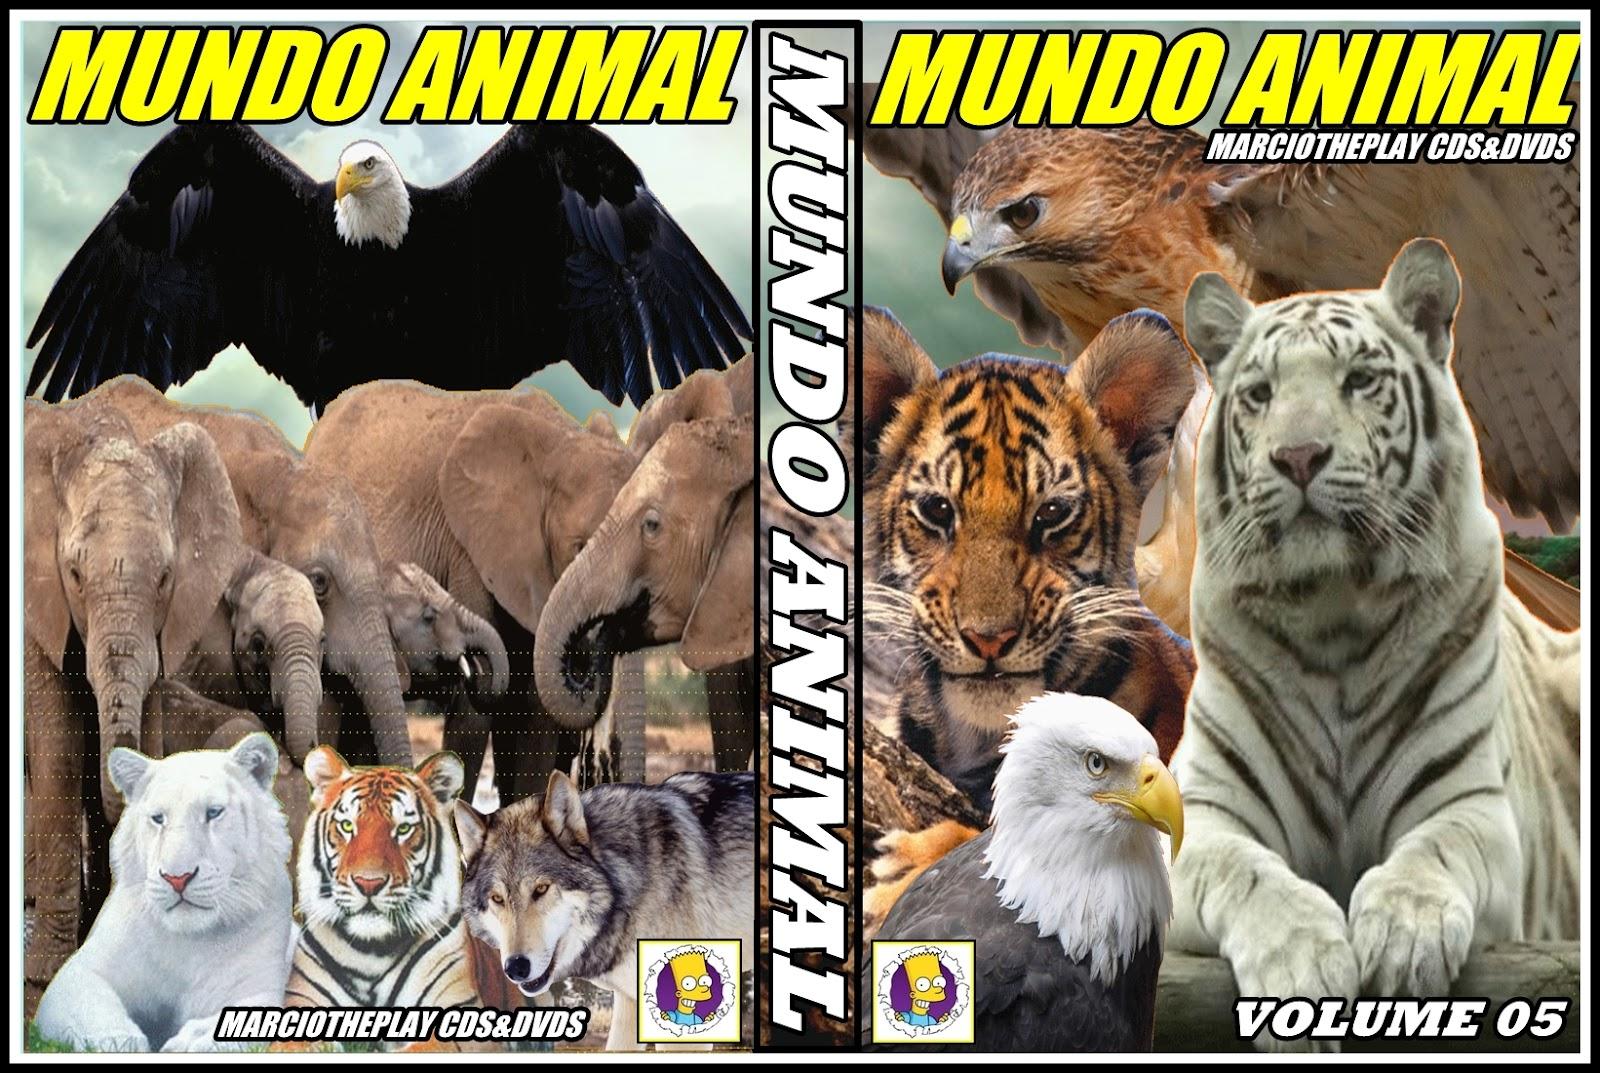 mundo animal volume 03